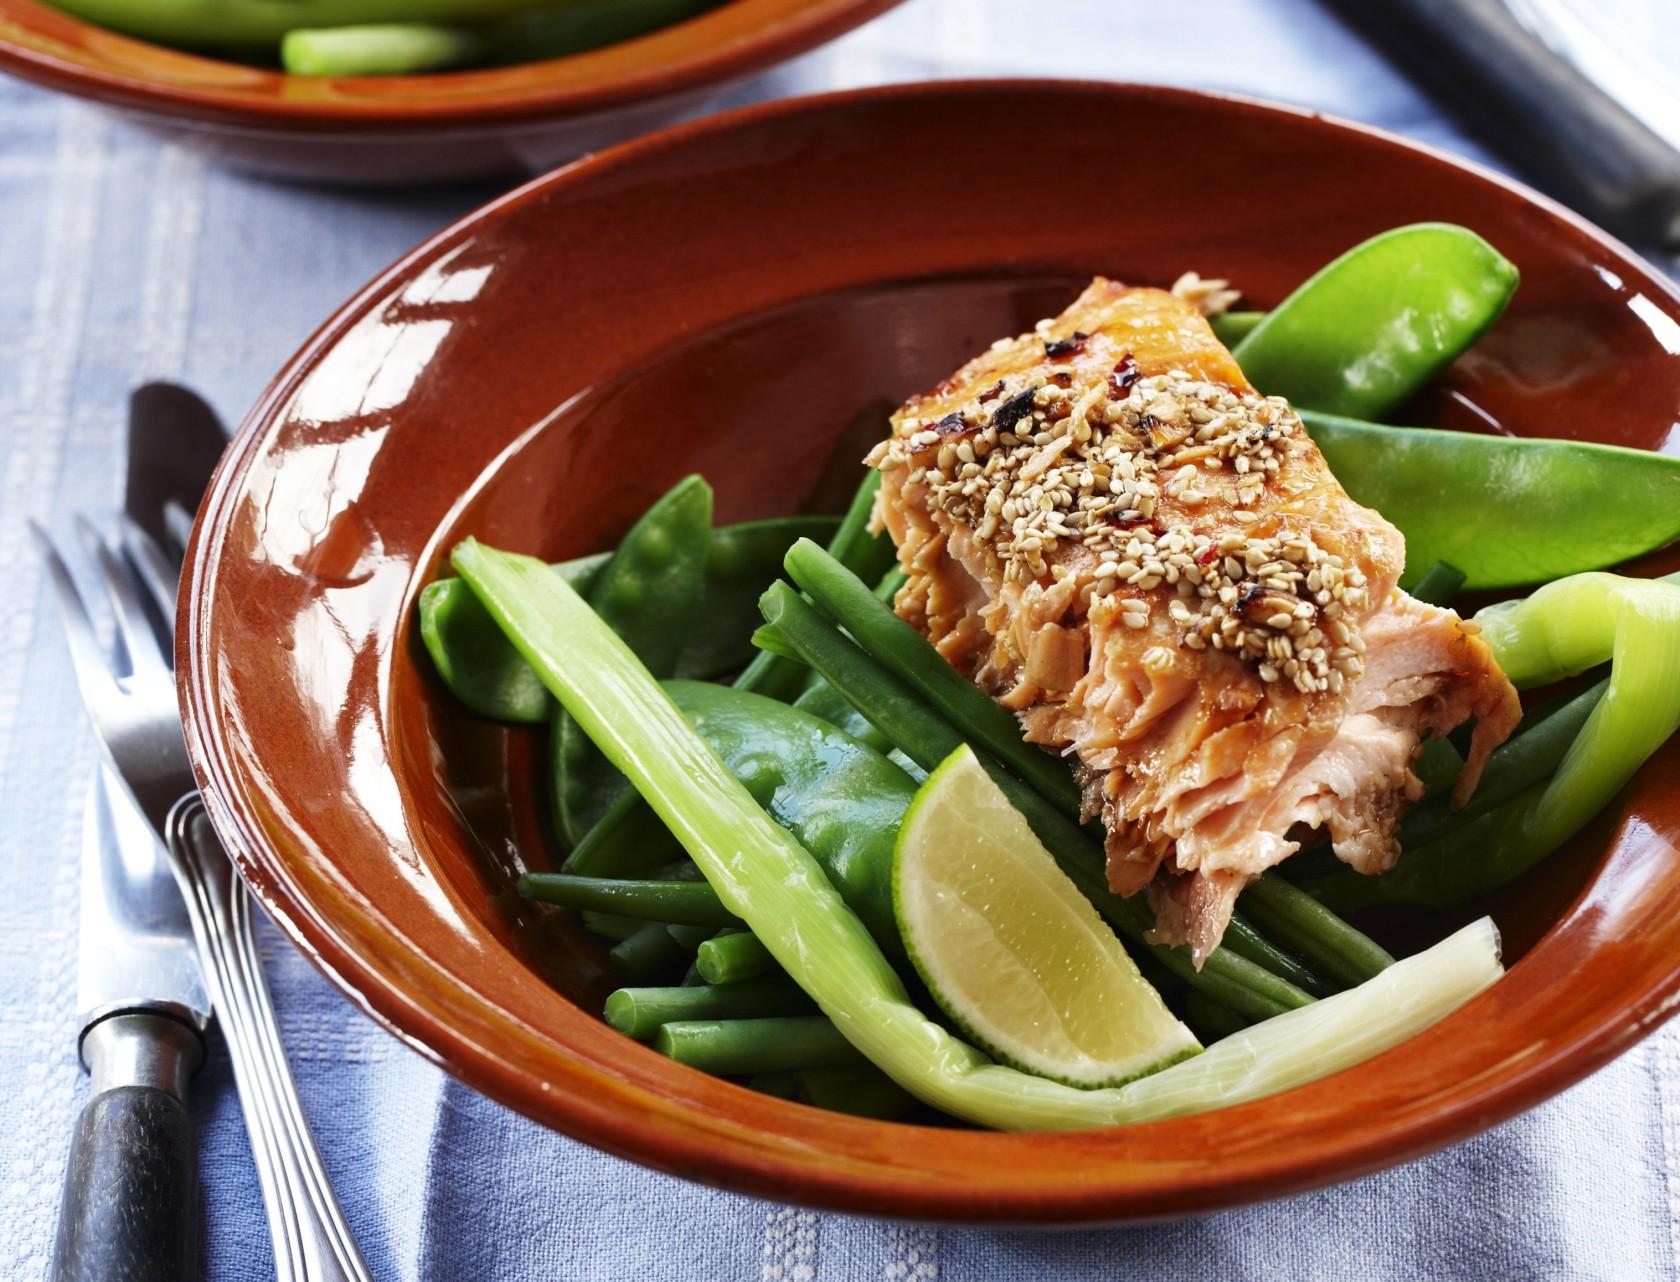 Teriyakilaks med sesam og dampede grøntsager - god opskrift på nem hverdagsmad.